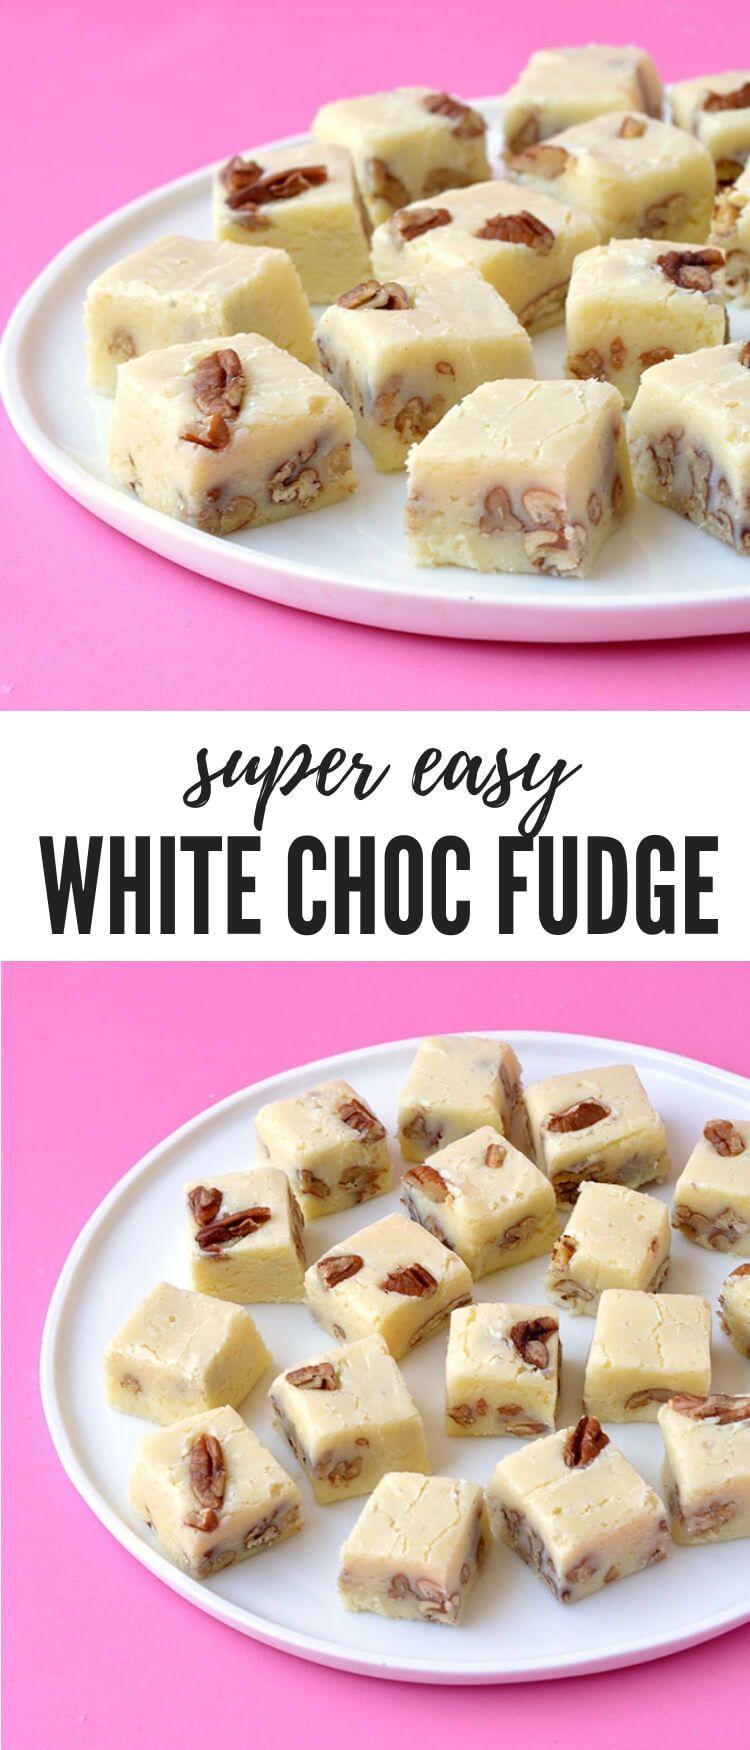 White Chocolate Fudge Super Easy Sweetest Menu Recipe Fudge Recipes Fudge Recipes Chocolate White Chocolate Recipes